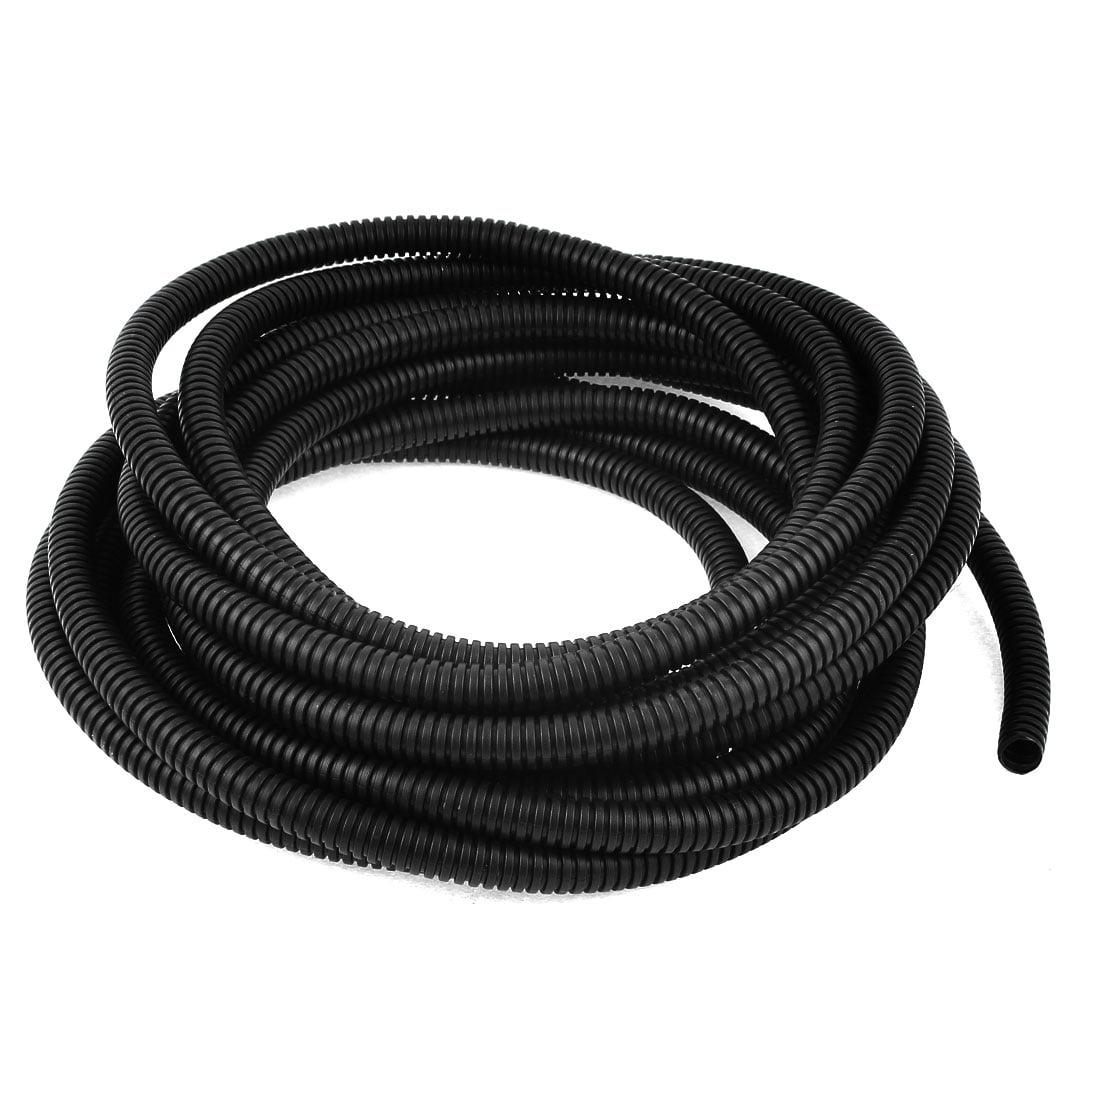 "1/2"" Diameter Flexible Corrugated Conduit Tube Pipe Hose Tubing 8M 26Ft"